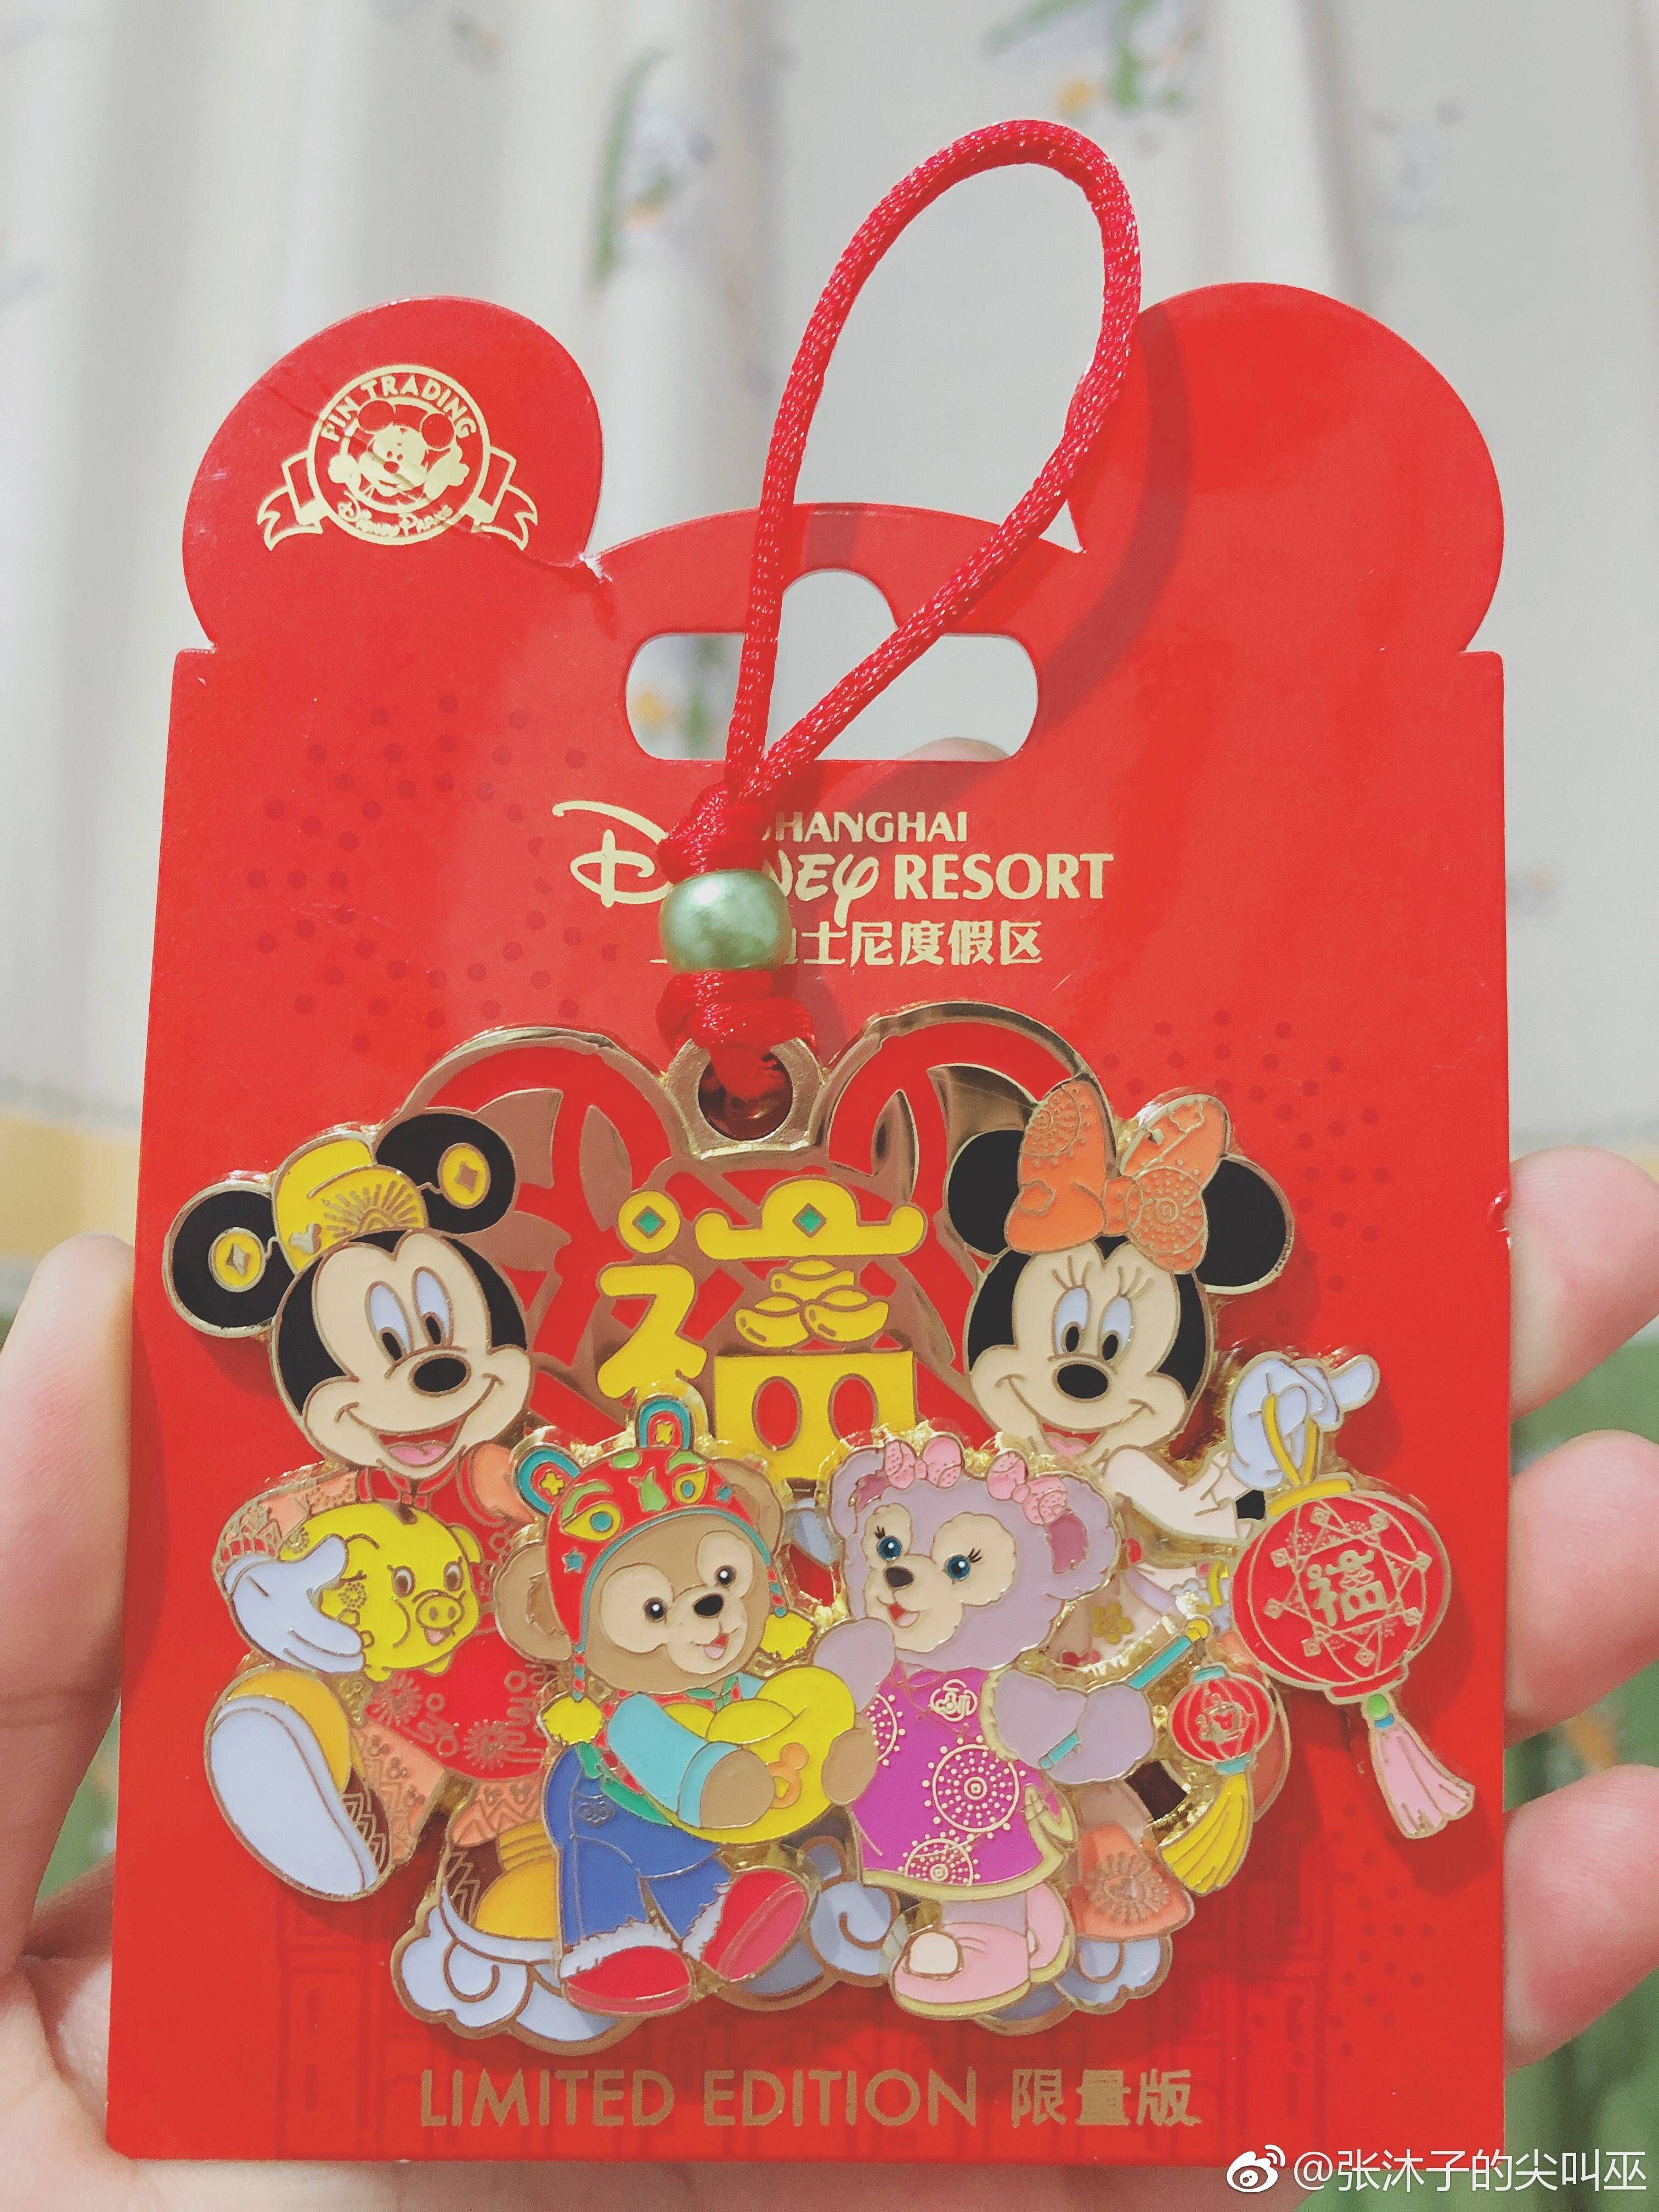 Pin on Disney pins